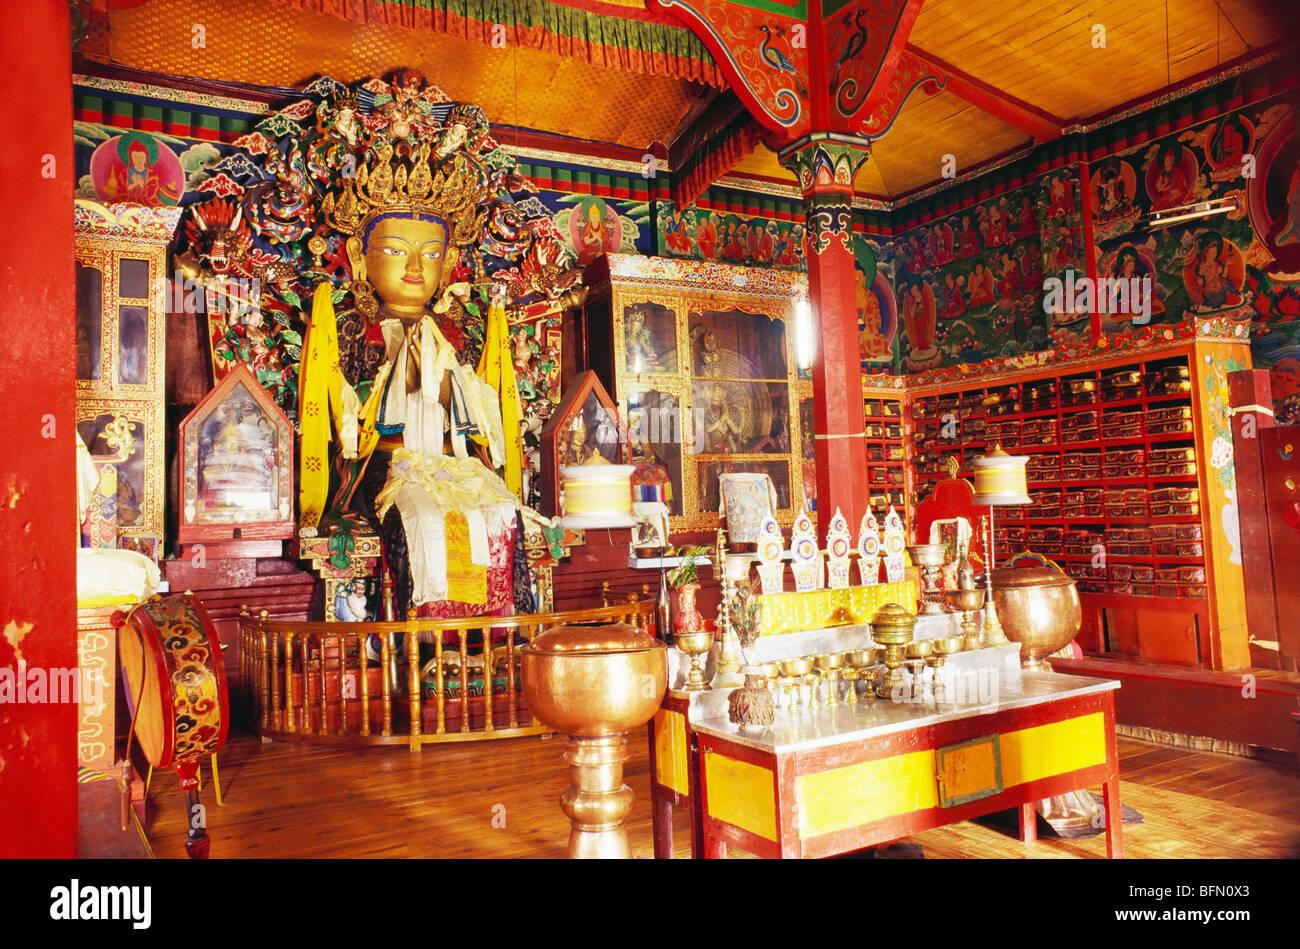 RMM 61095 Buddha Statue In Ghoom Monastery Darjeeling West Bengal India